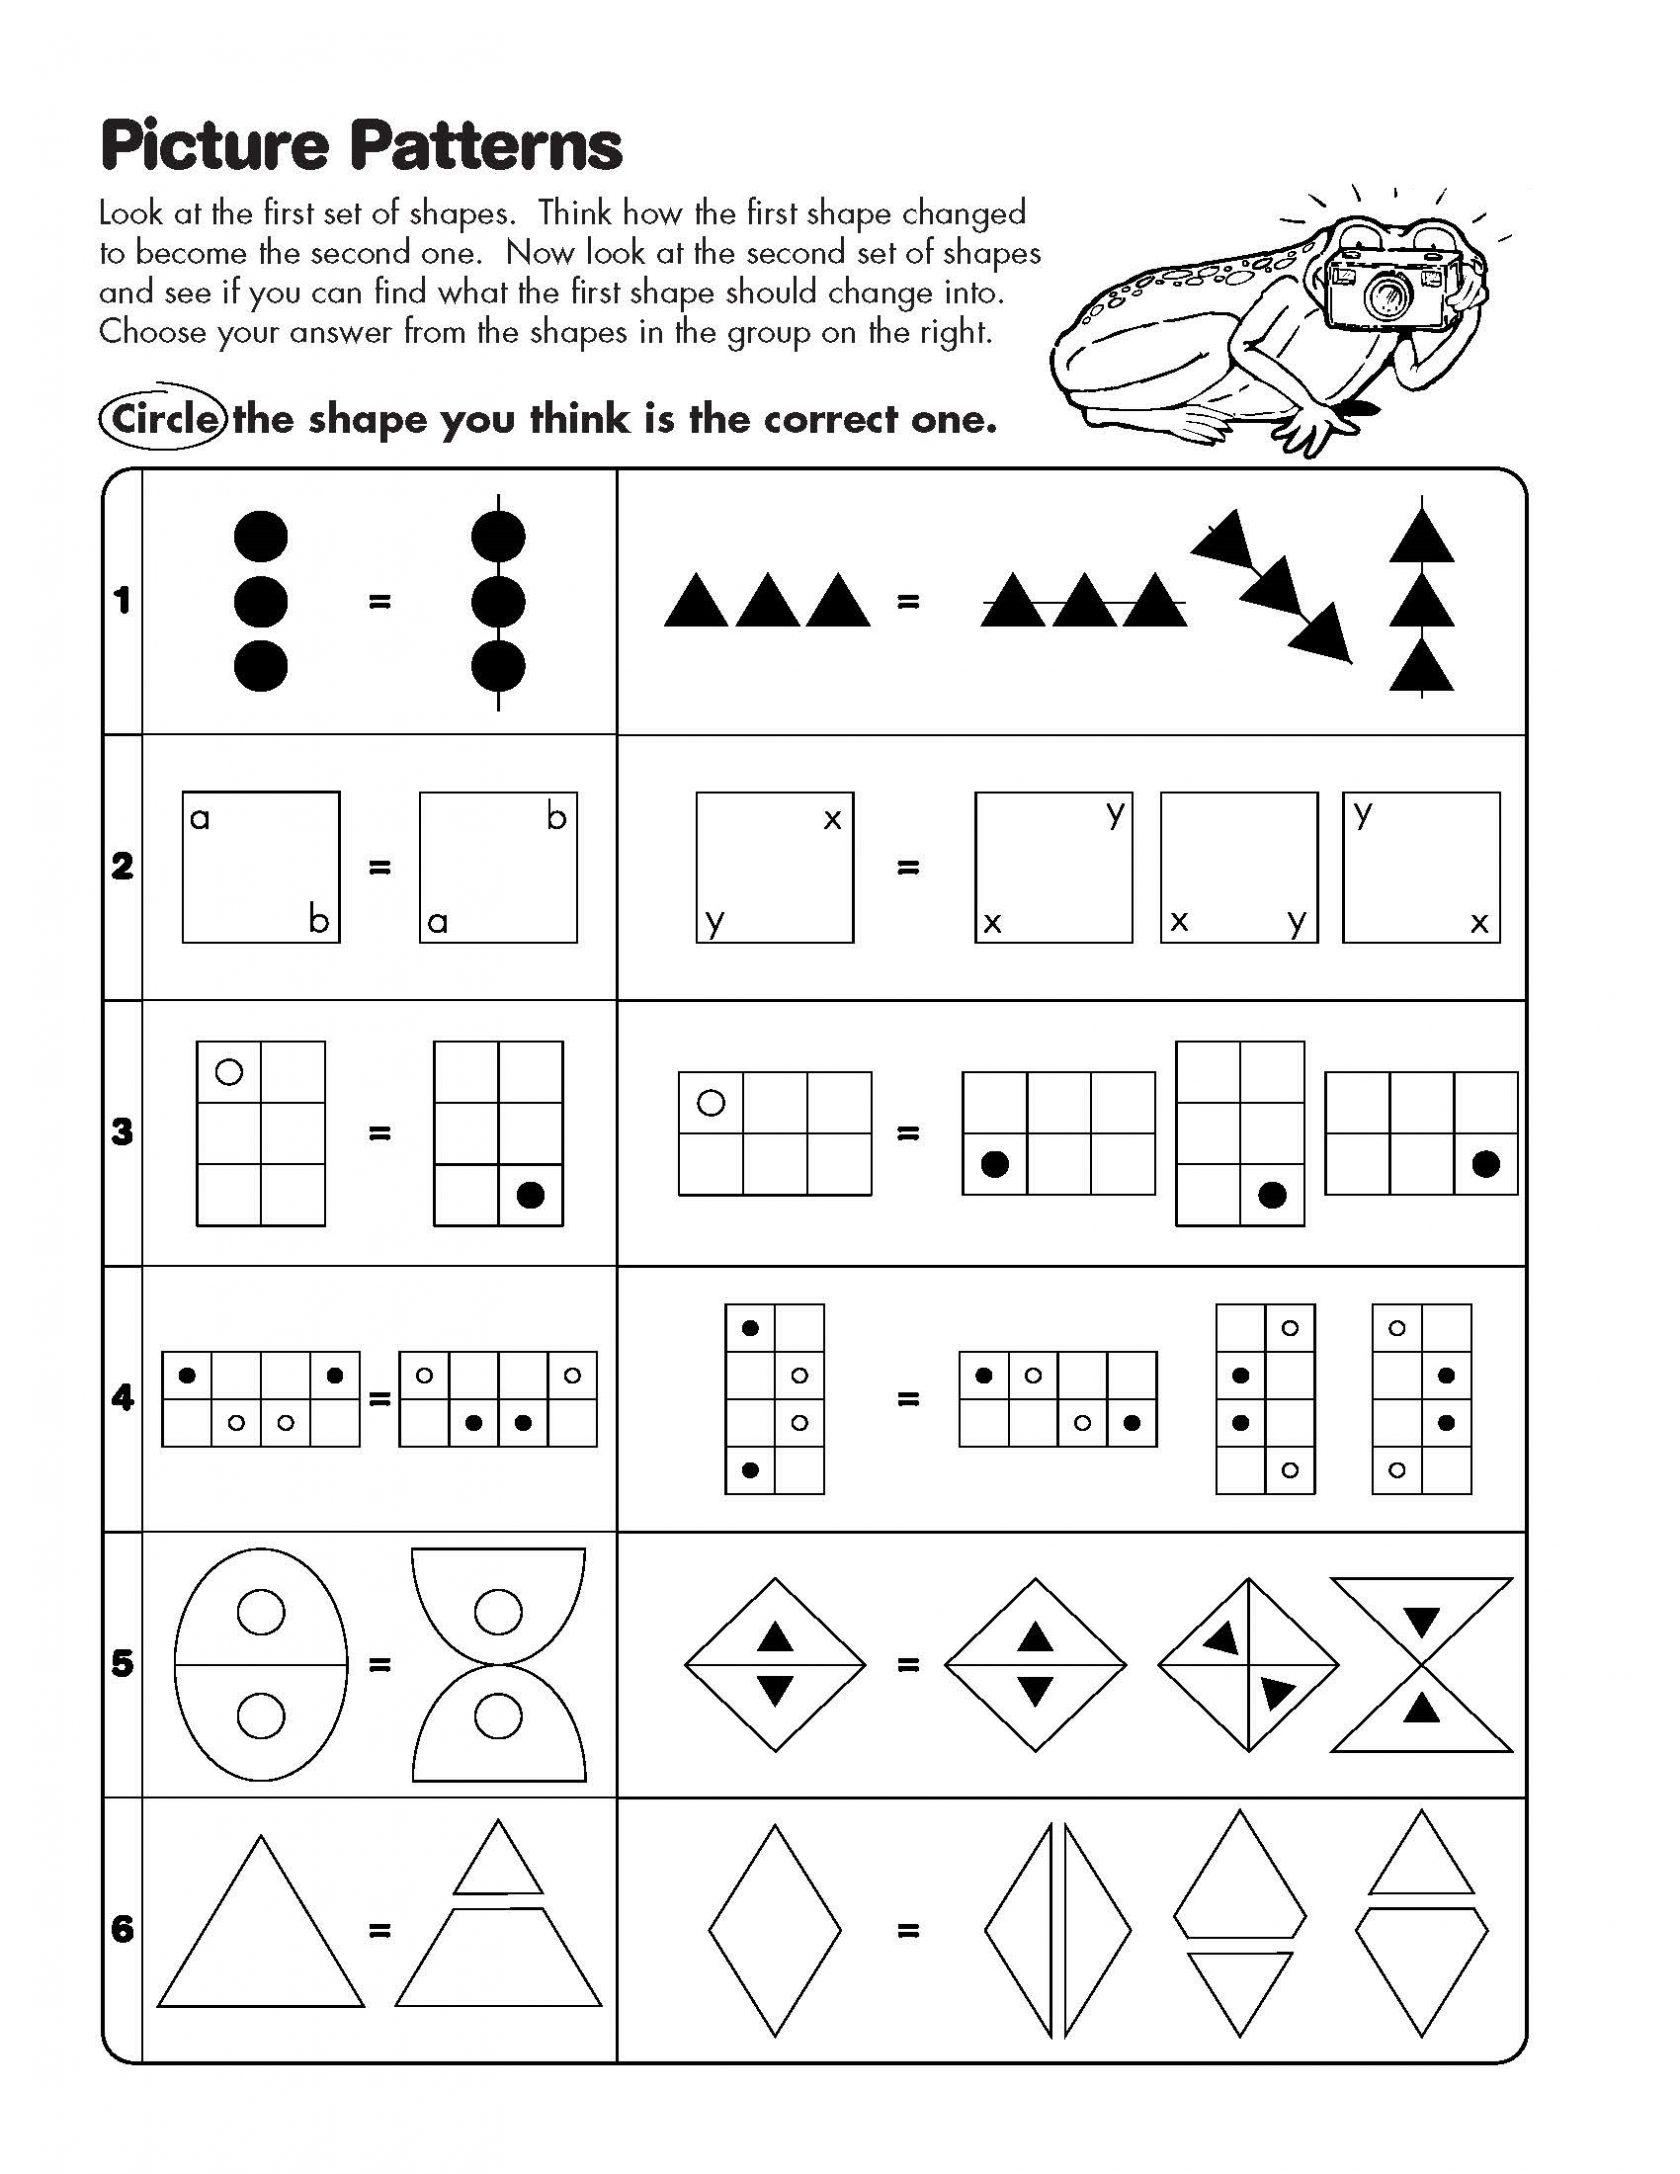 Mathts Pattern Maths One Attribute Shape Christmas Picture